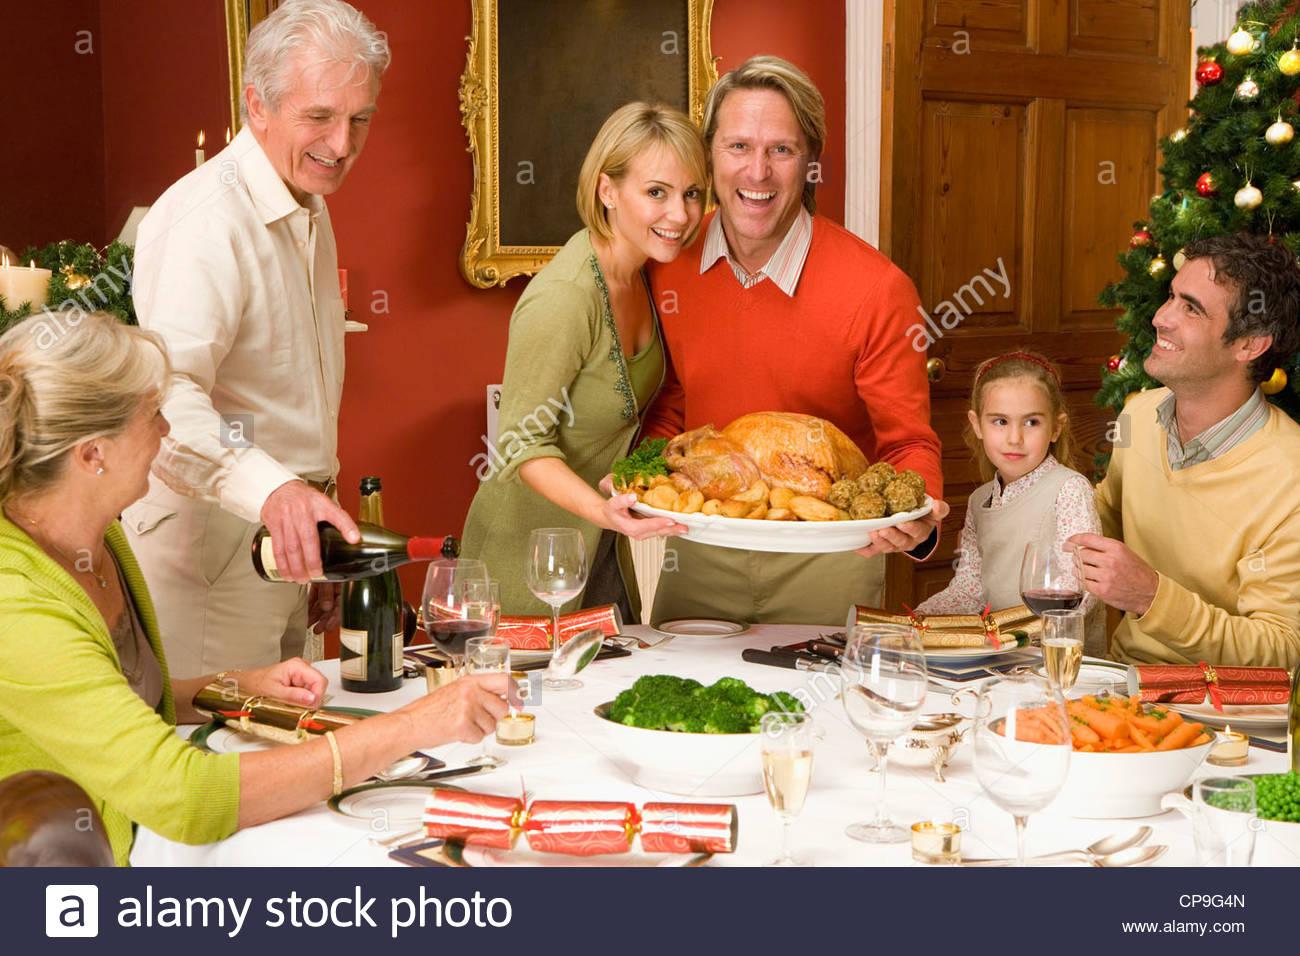 Family having Christmas dinner, portrait of couple with turkeyStock Photo